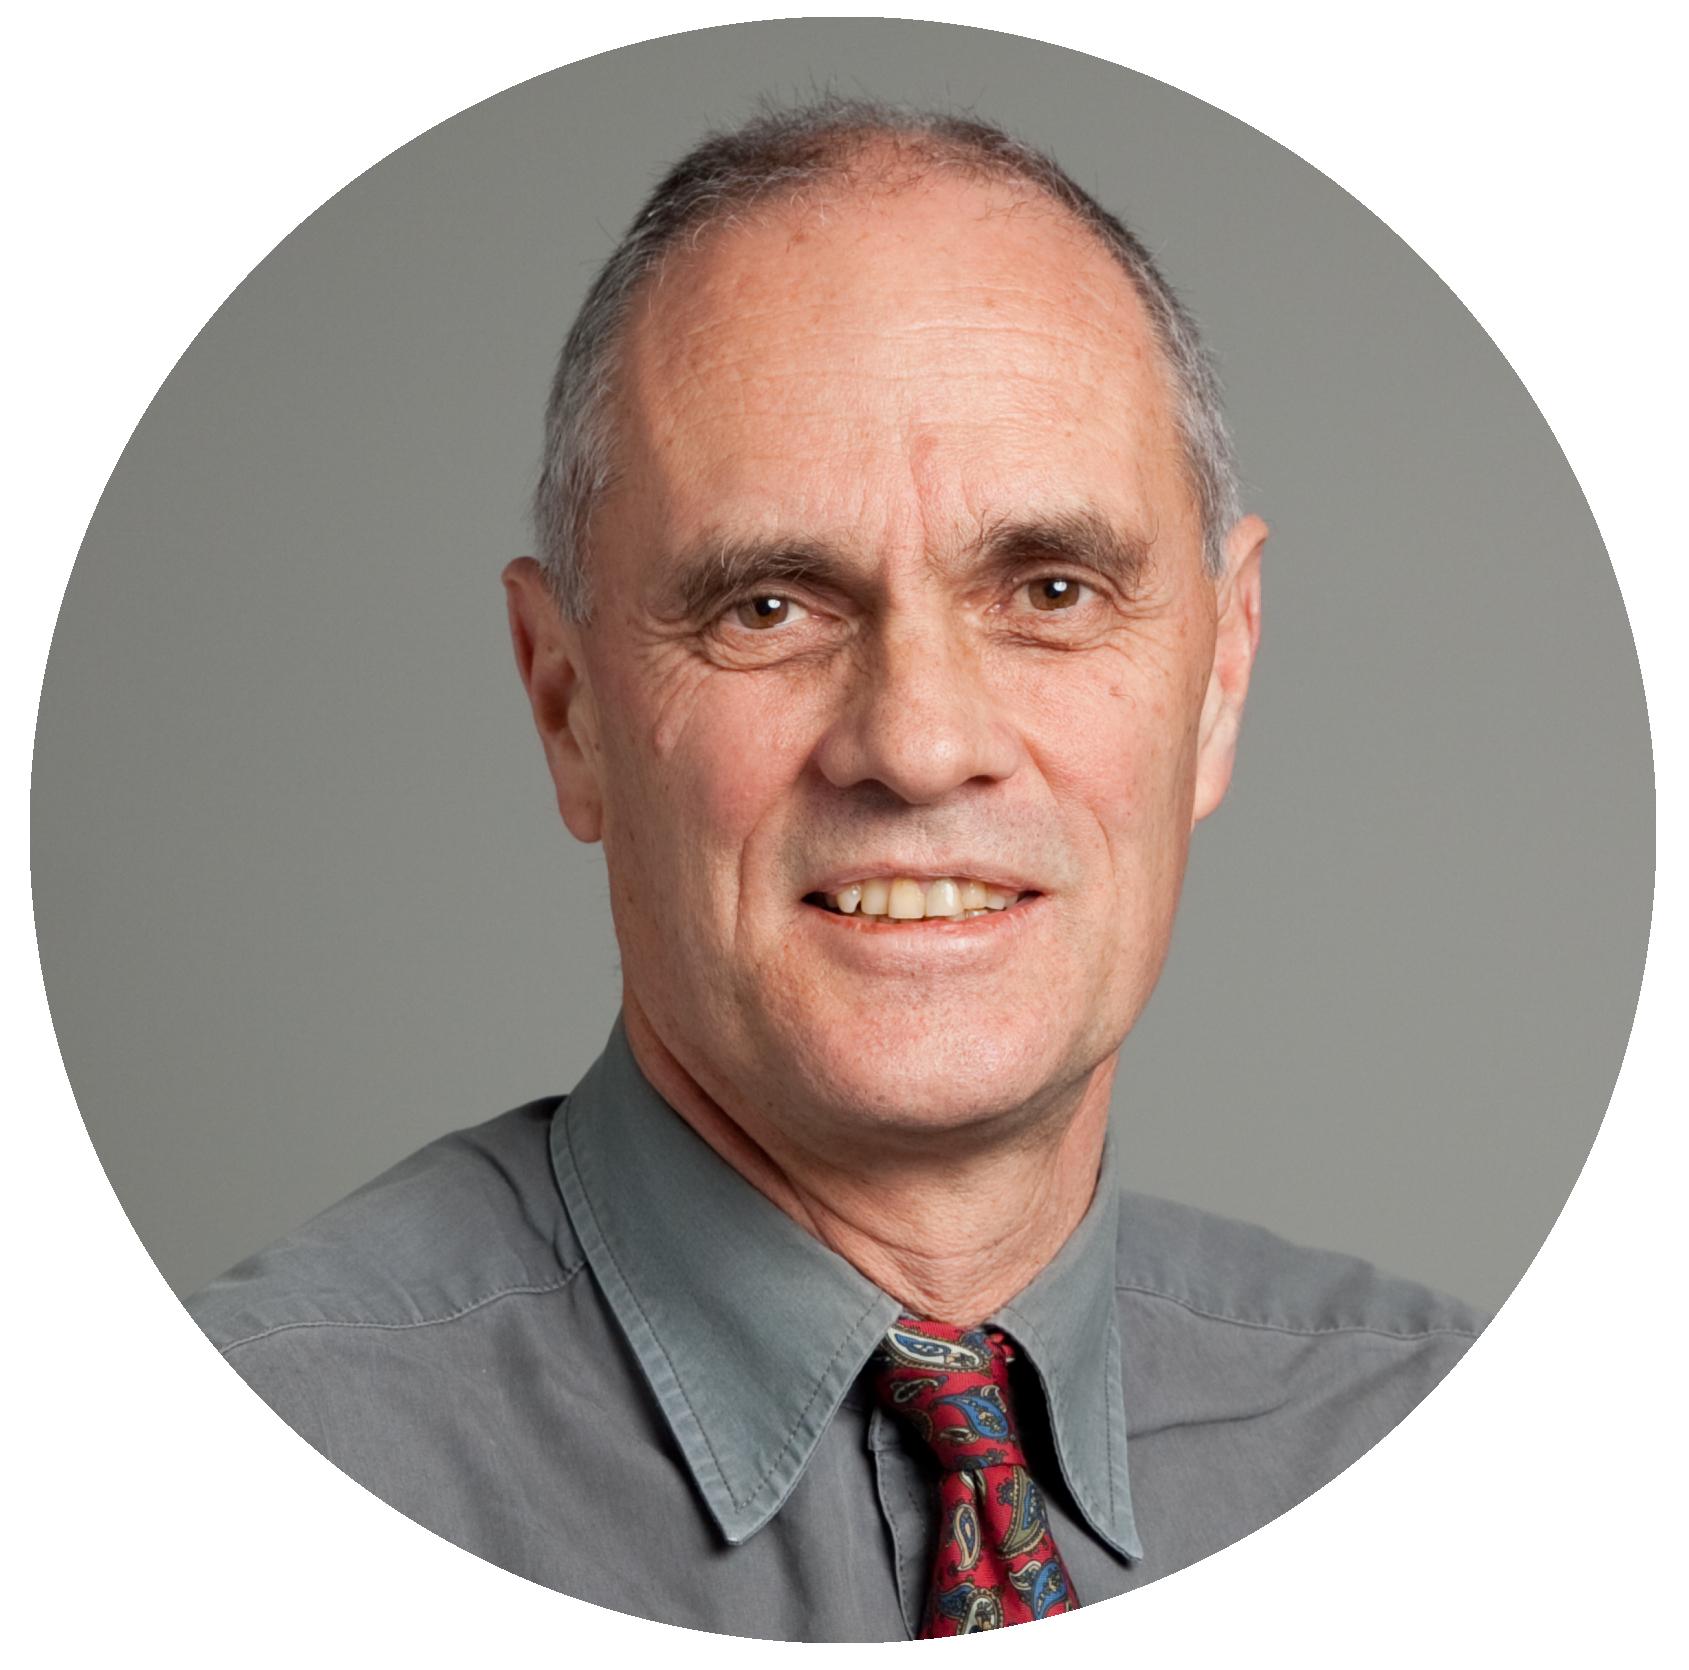 Dr Tim Martin